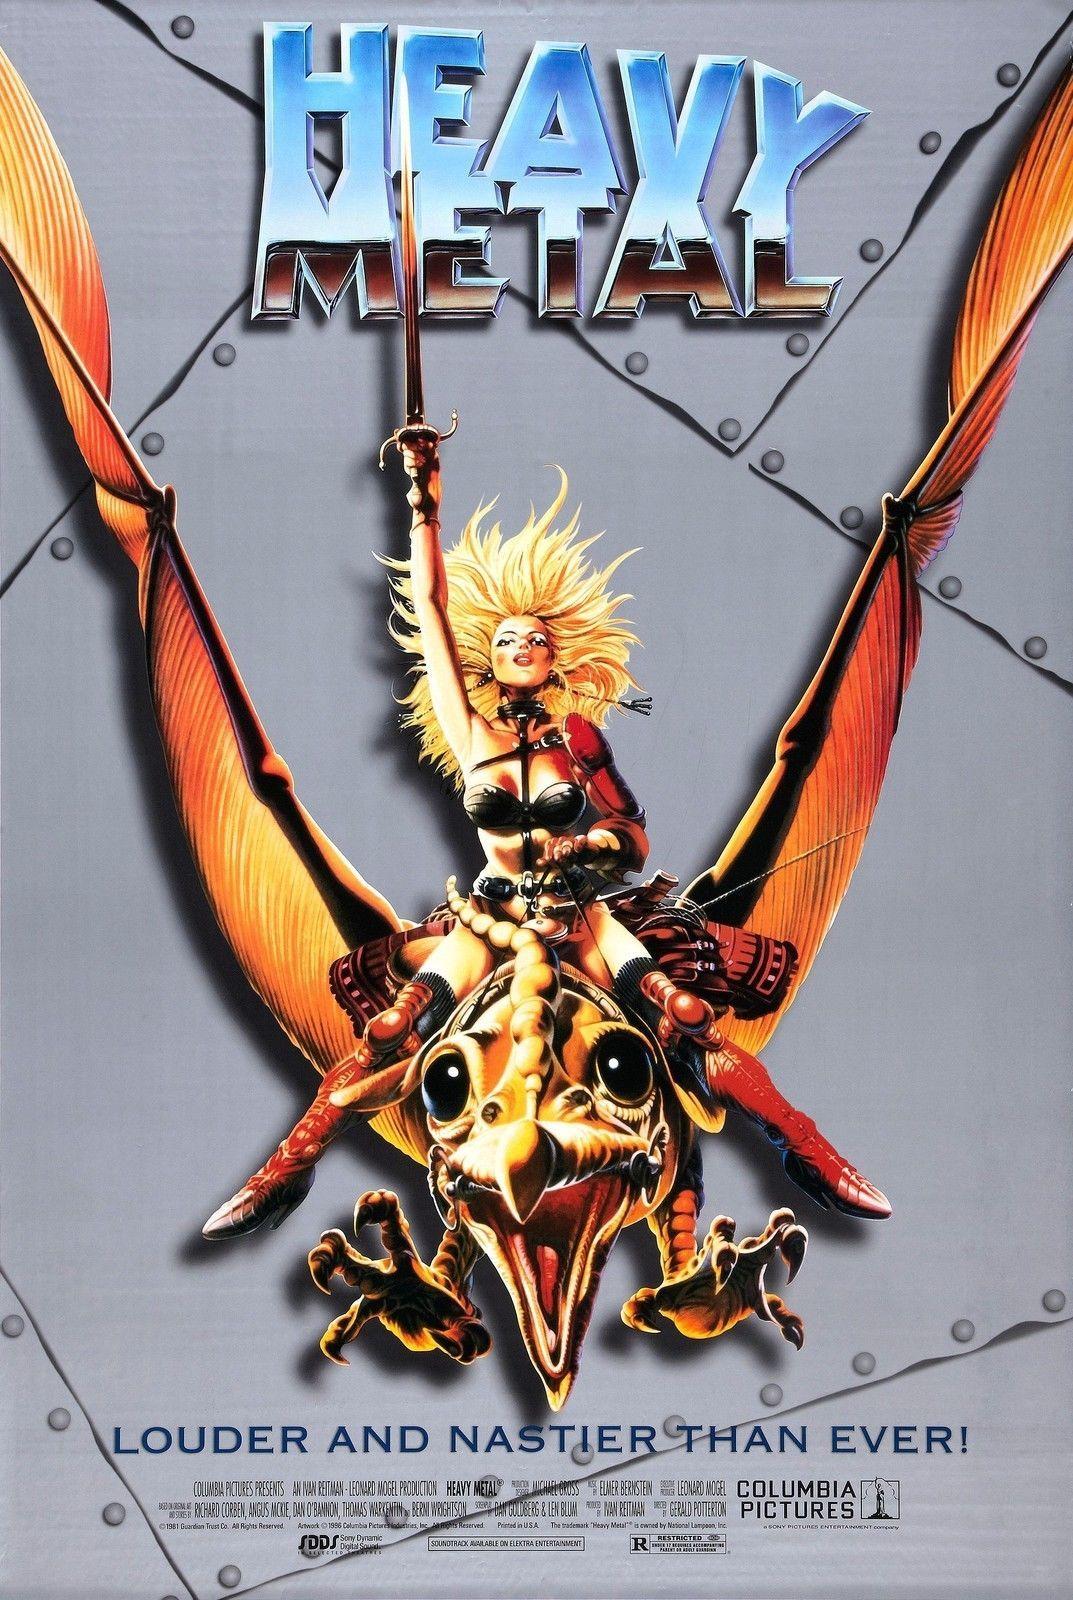 HEAVY METAL Movie Art Silk Poster 24x36inch 24x43inch 1249